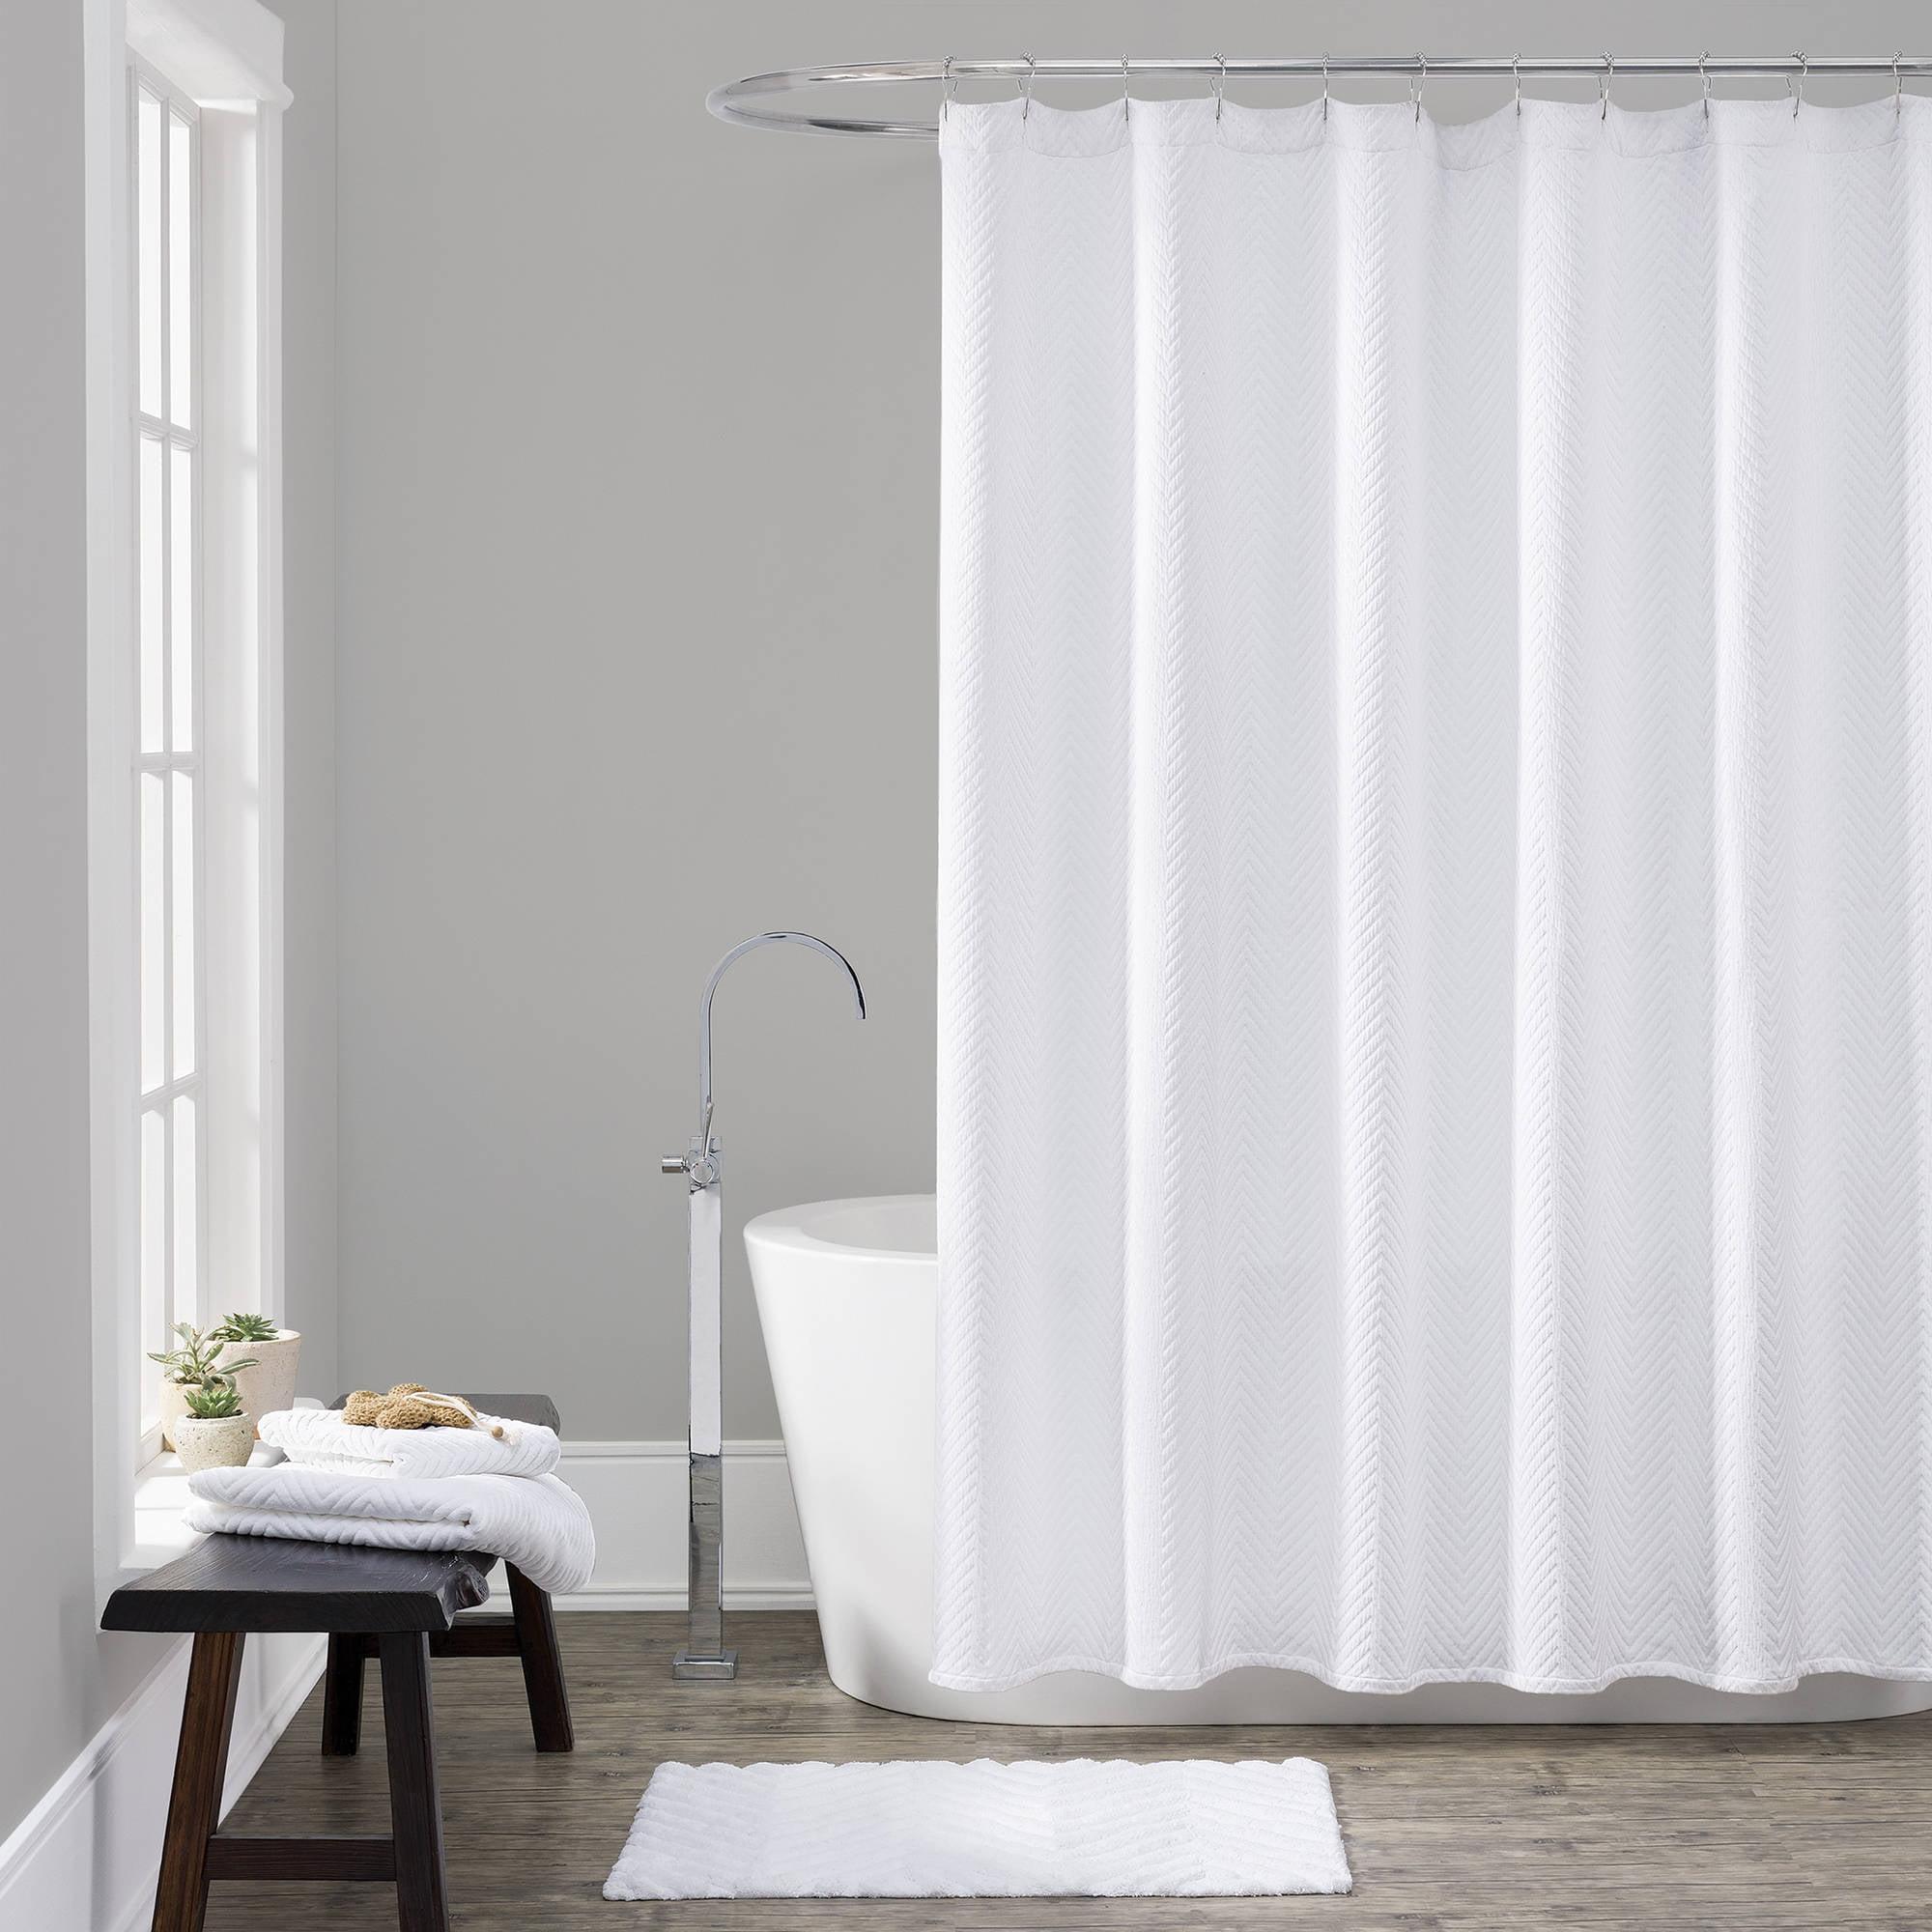 shower set mutable hill park designs curtains mosaic ar leaf hooks matching curtain chapel window scenic designer stall croscill supple